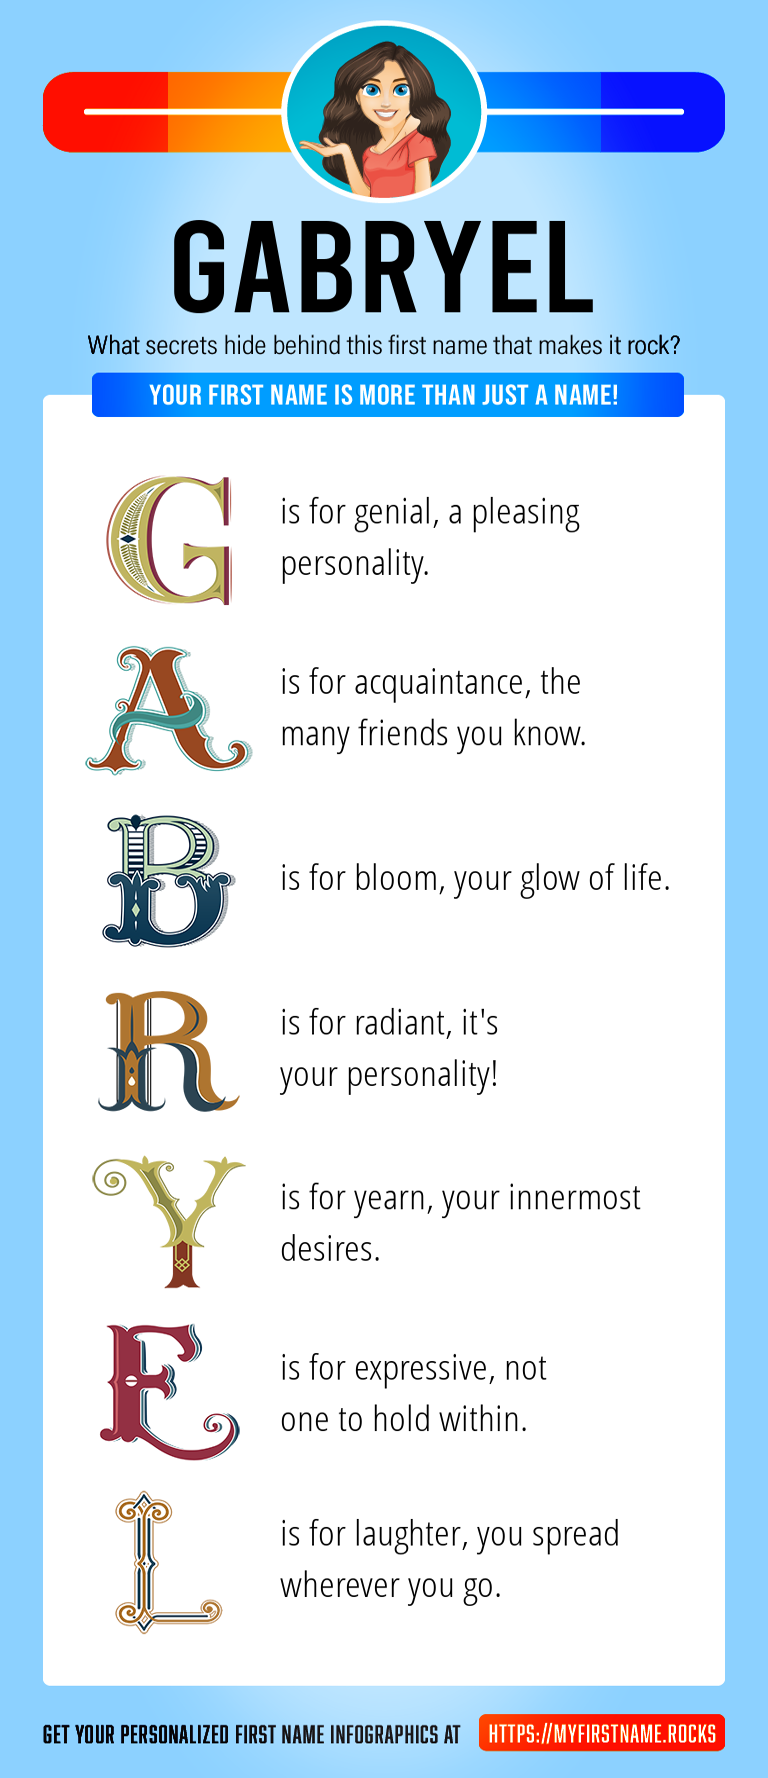 Gabryel Infographics